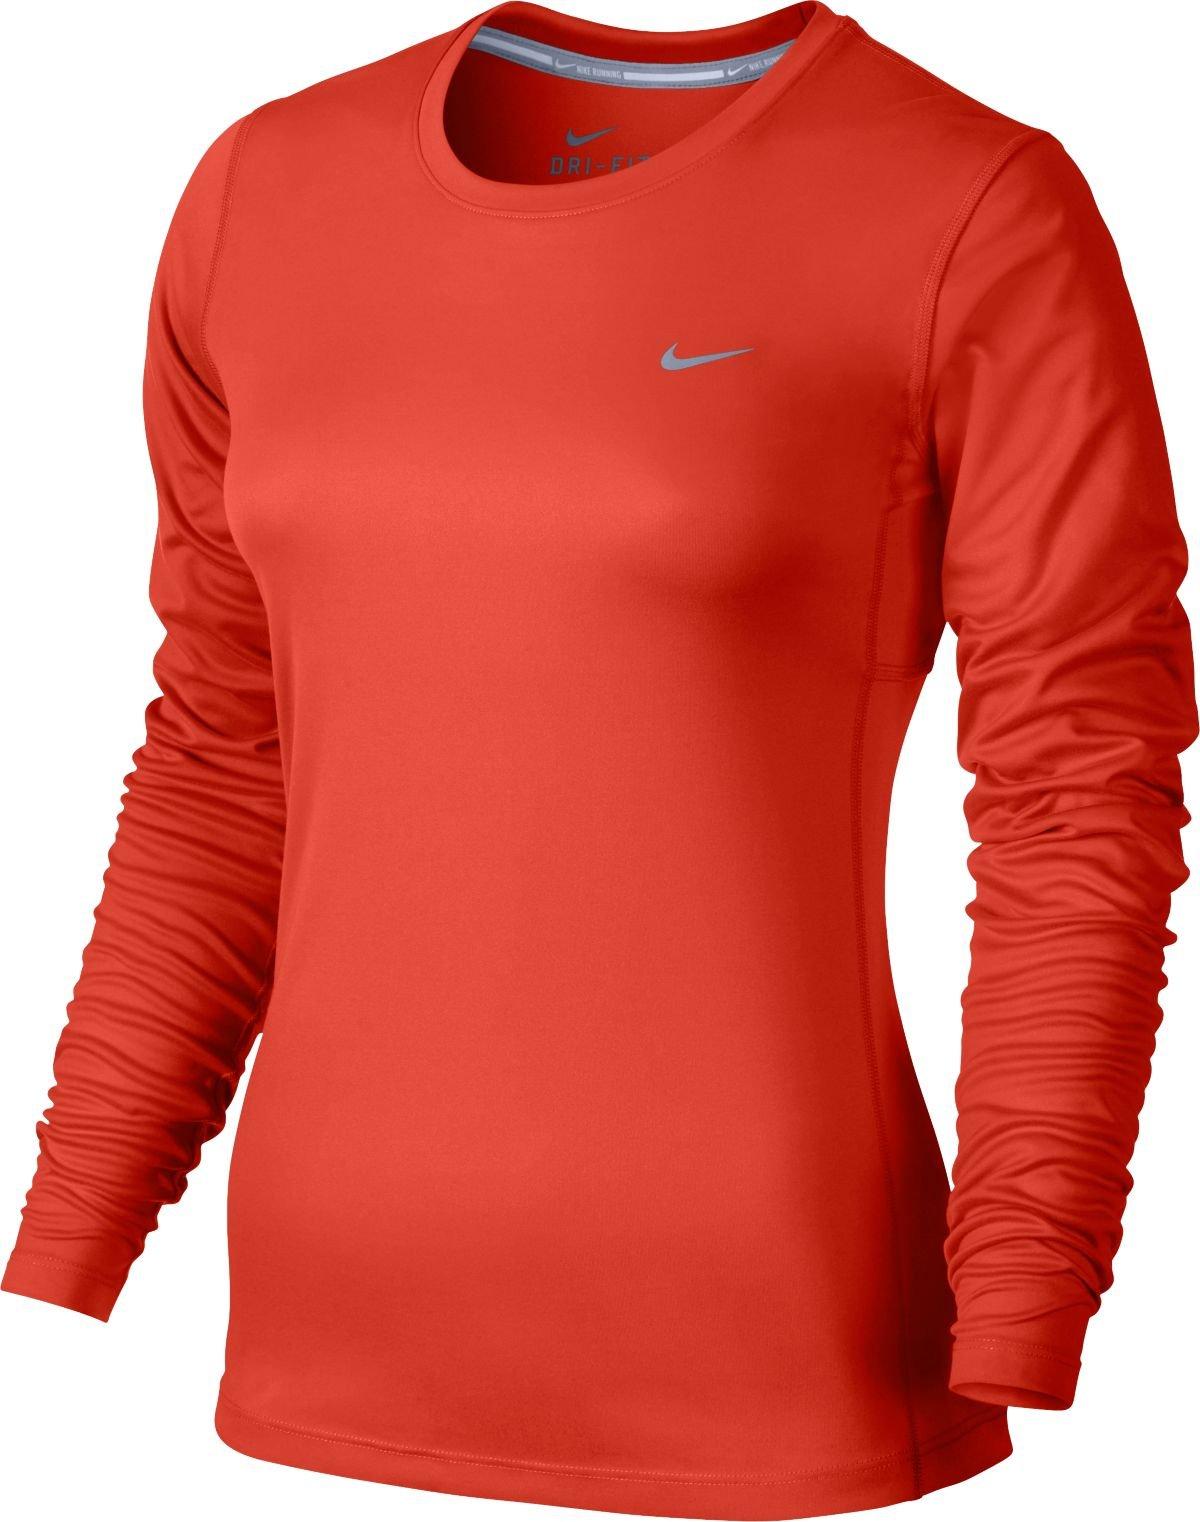 Triko s dlouhým rukávem Nike MILER LONG SLEEVE